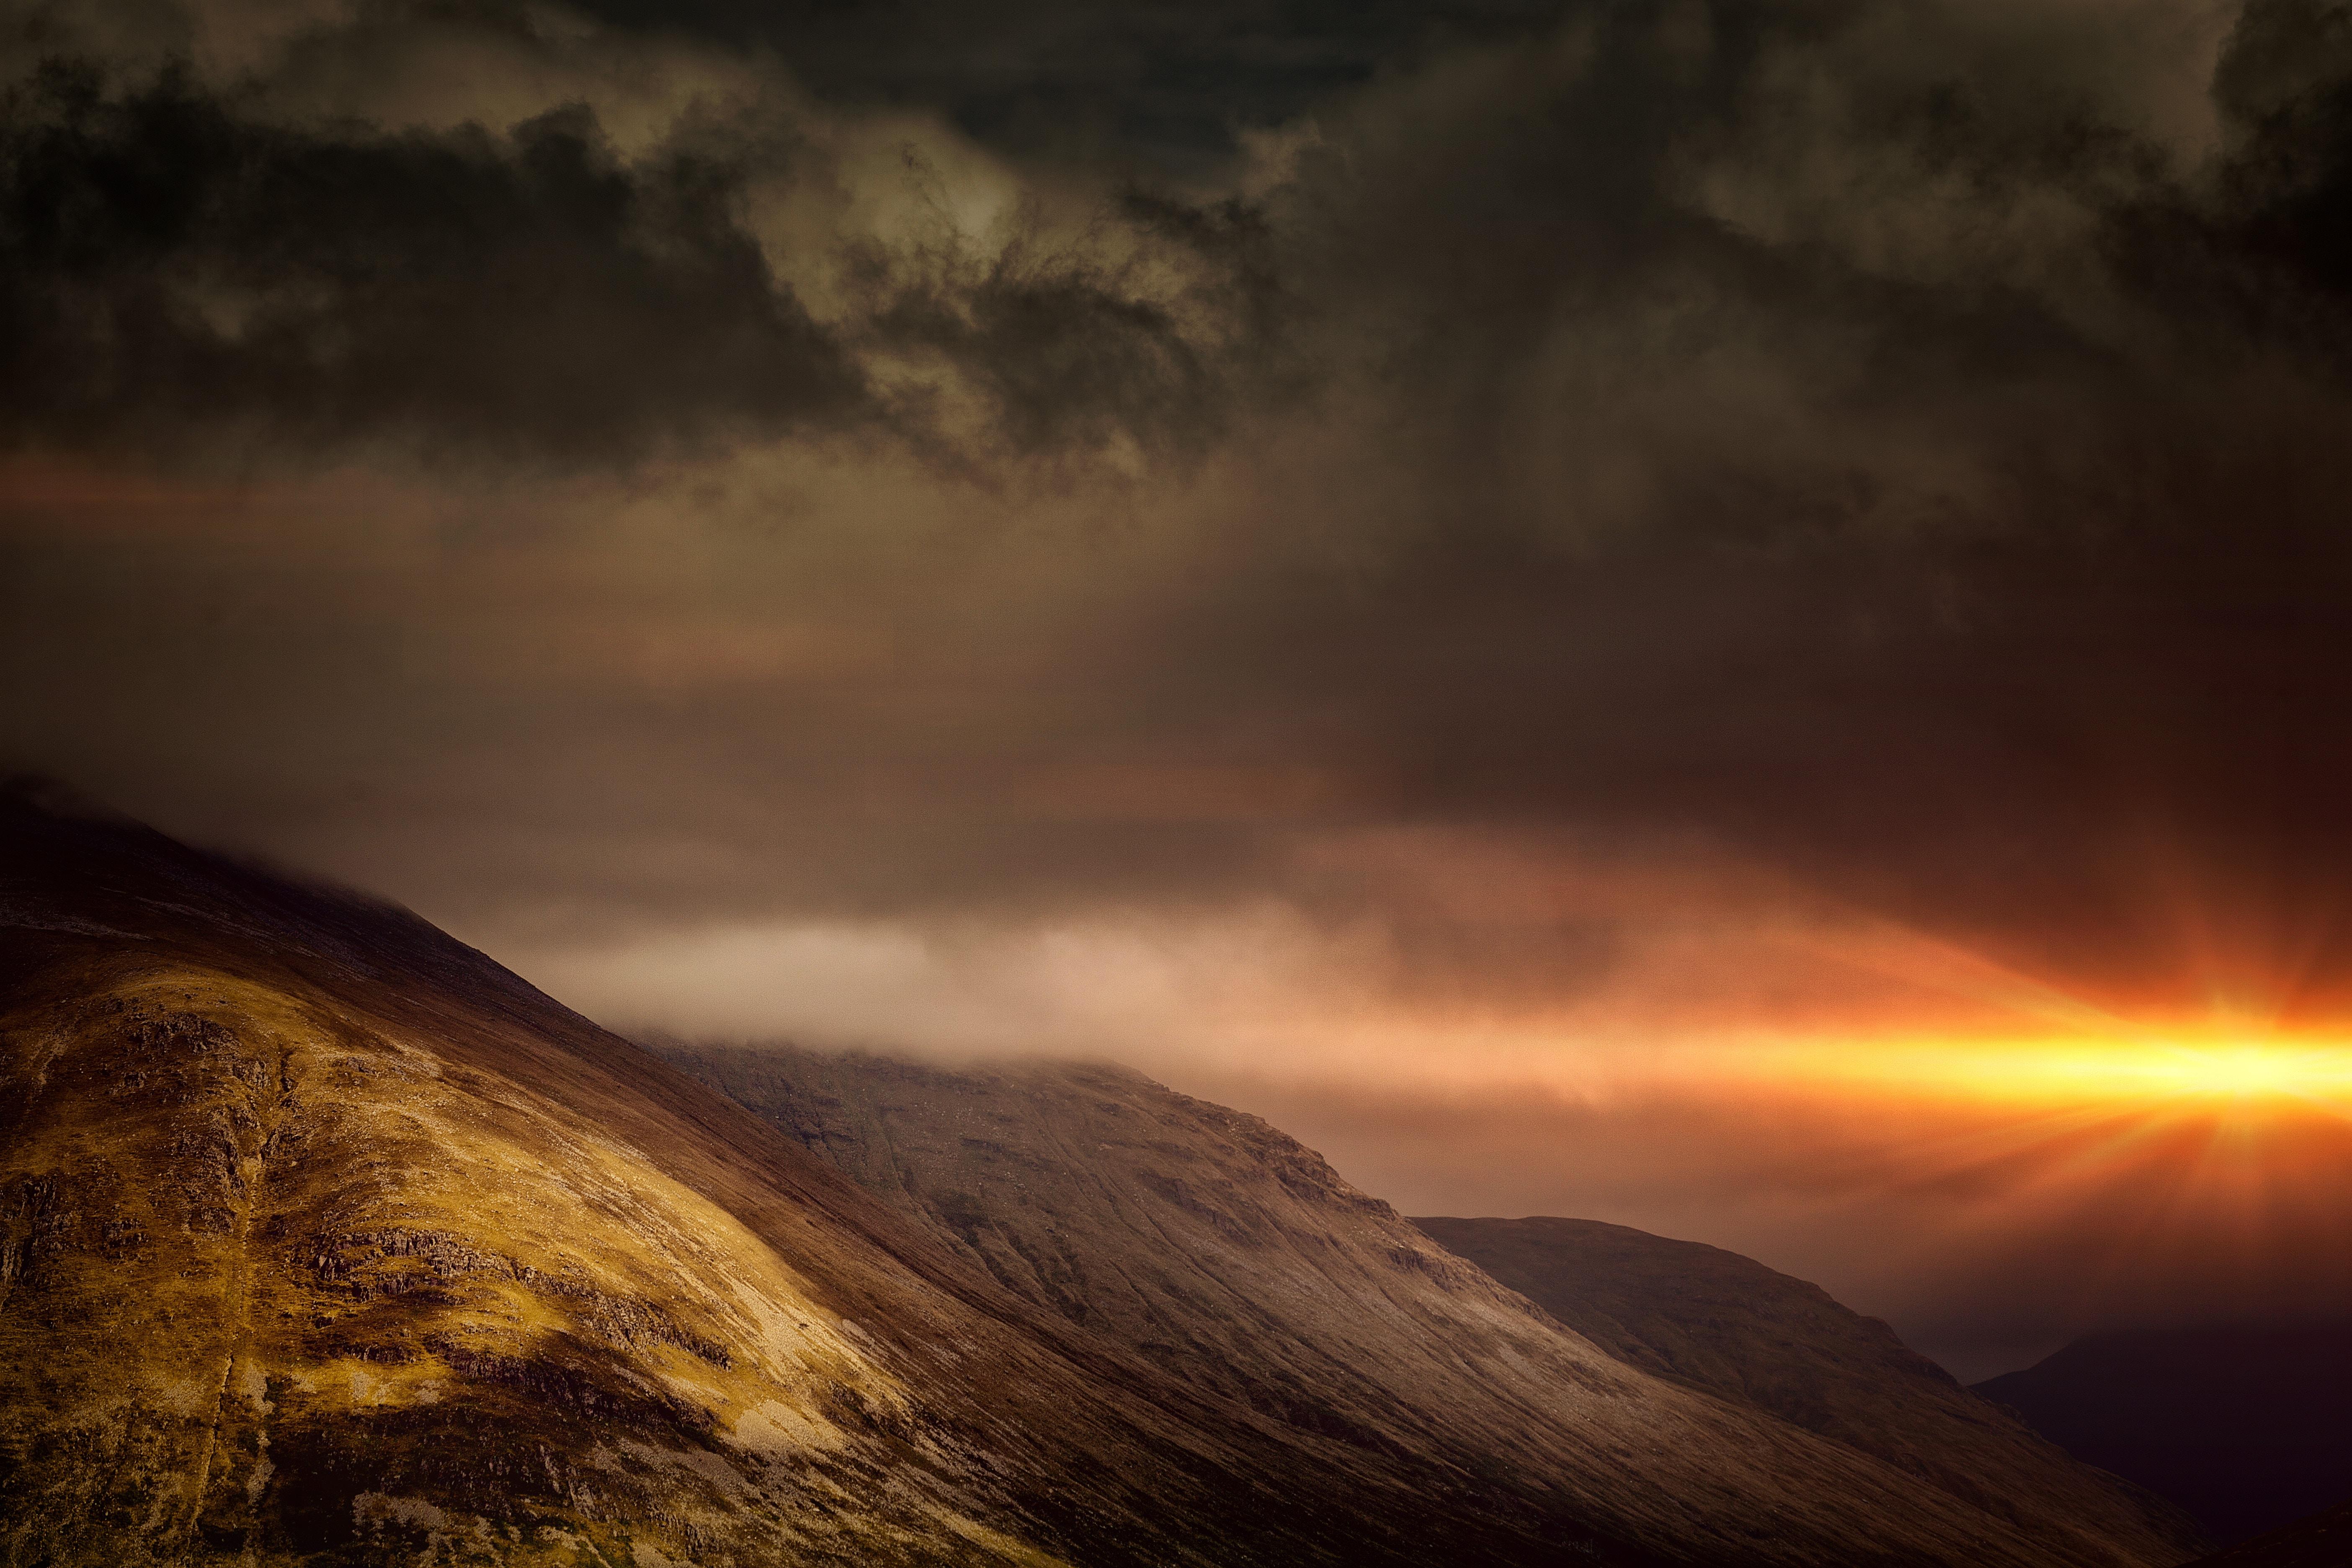 cloudy mountain phone wallpaper - photo #4